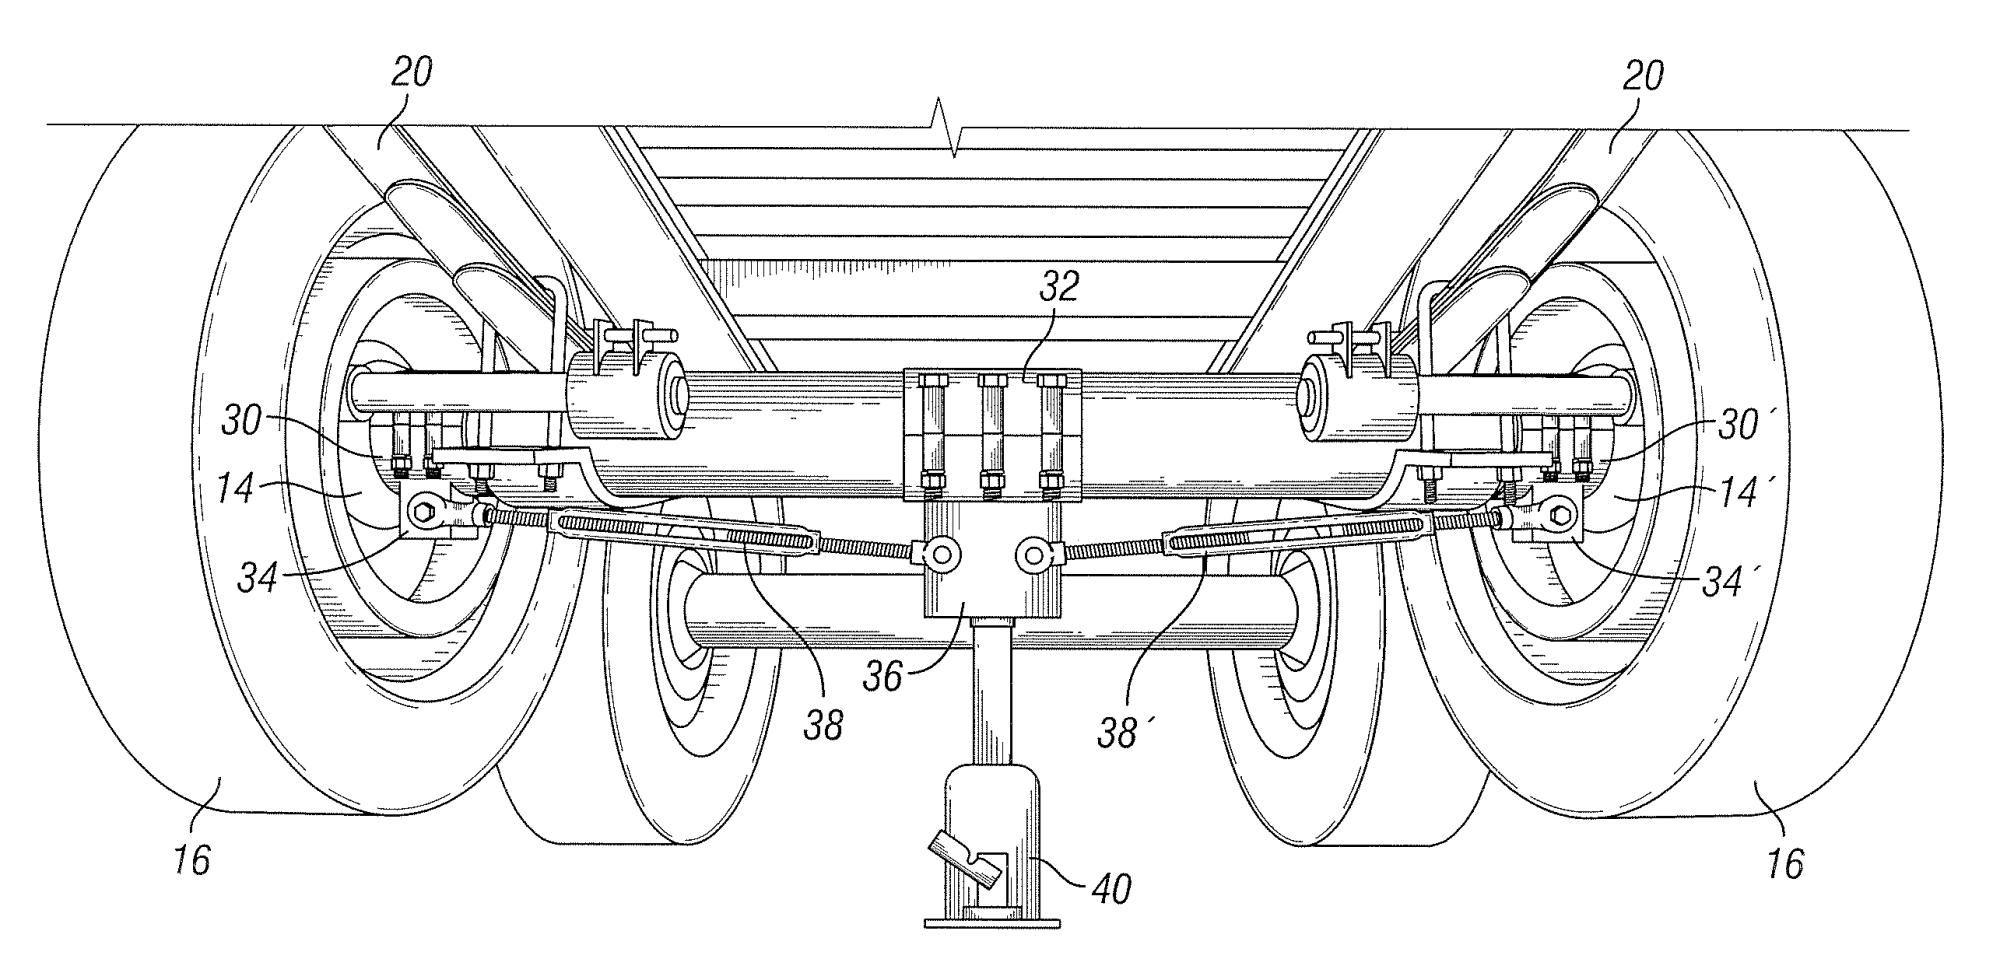 hight resolution of brevet us8333015 method for adjusting axle camber google brevets tractor trailer axles diagrams